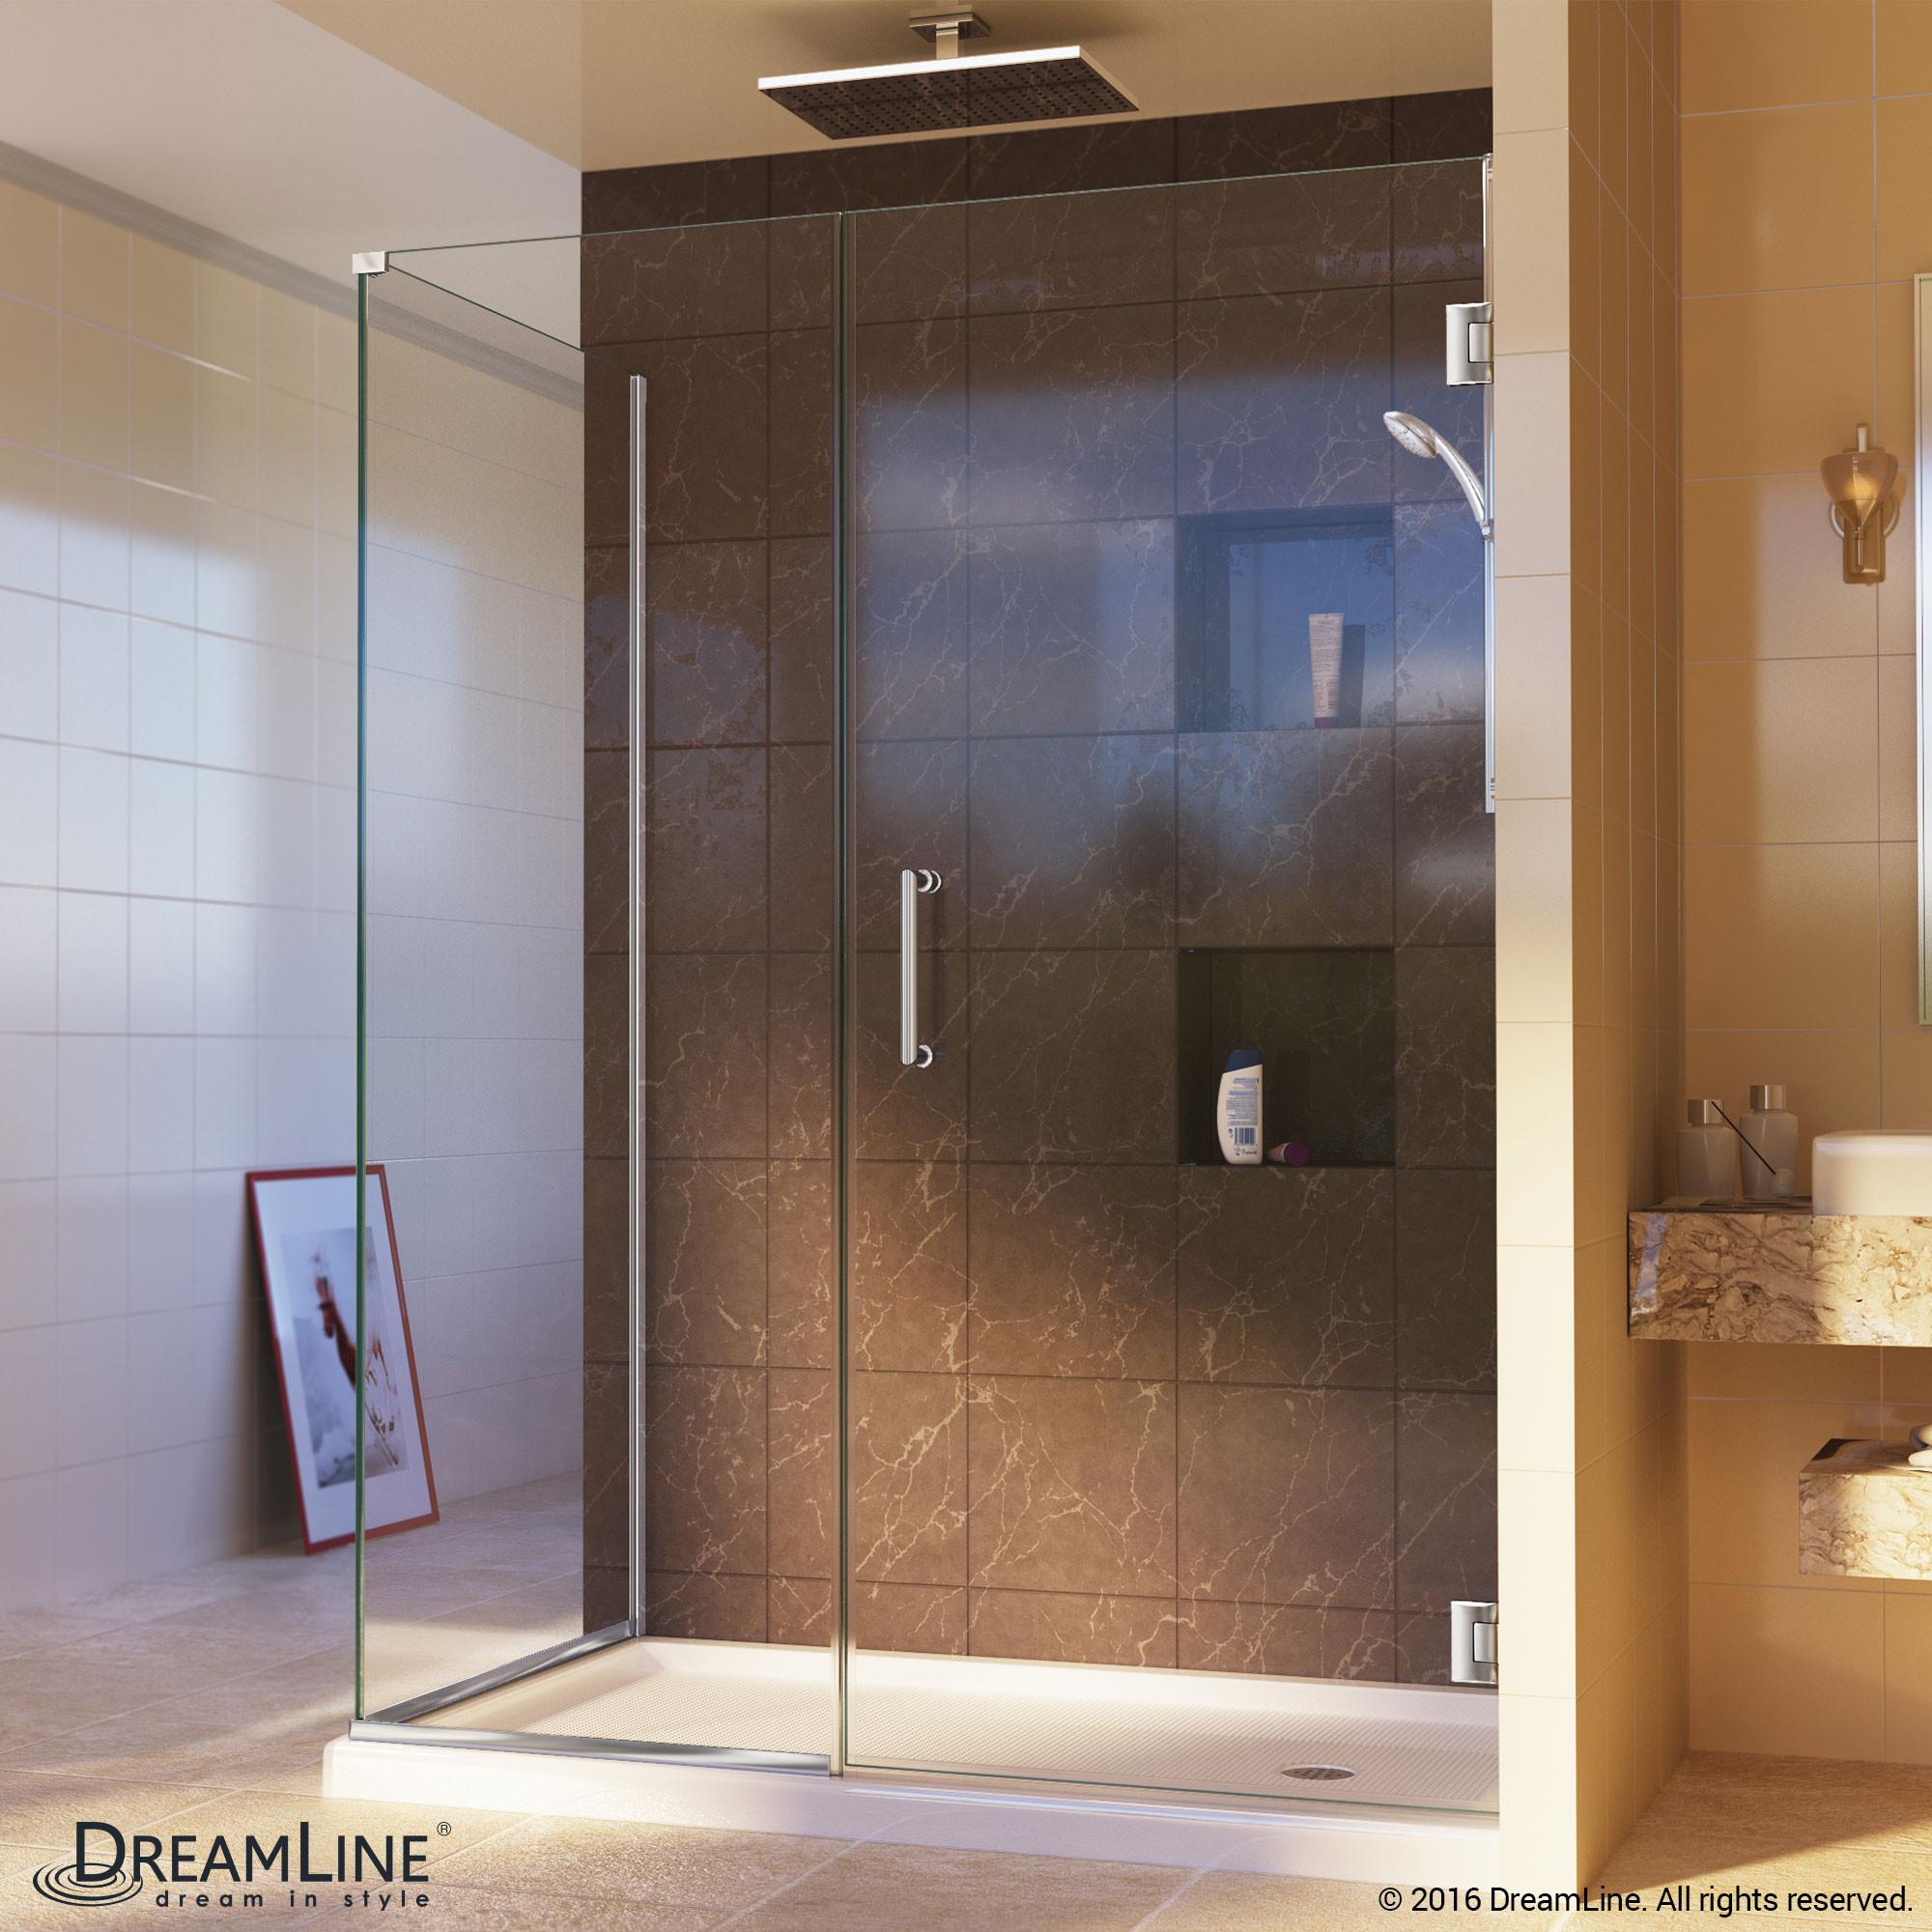 DreamLine SHEN-24460300-01 Unidoor Plus Hinged Shower Enclosure In Chrome Finish Hardware